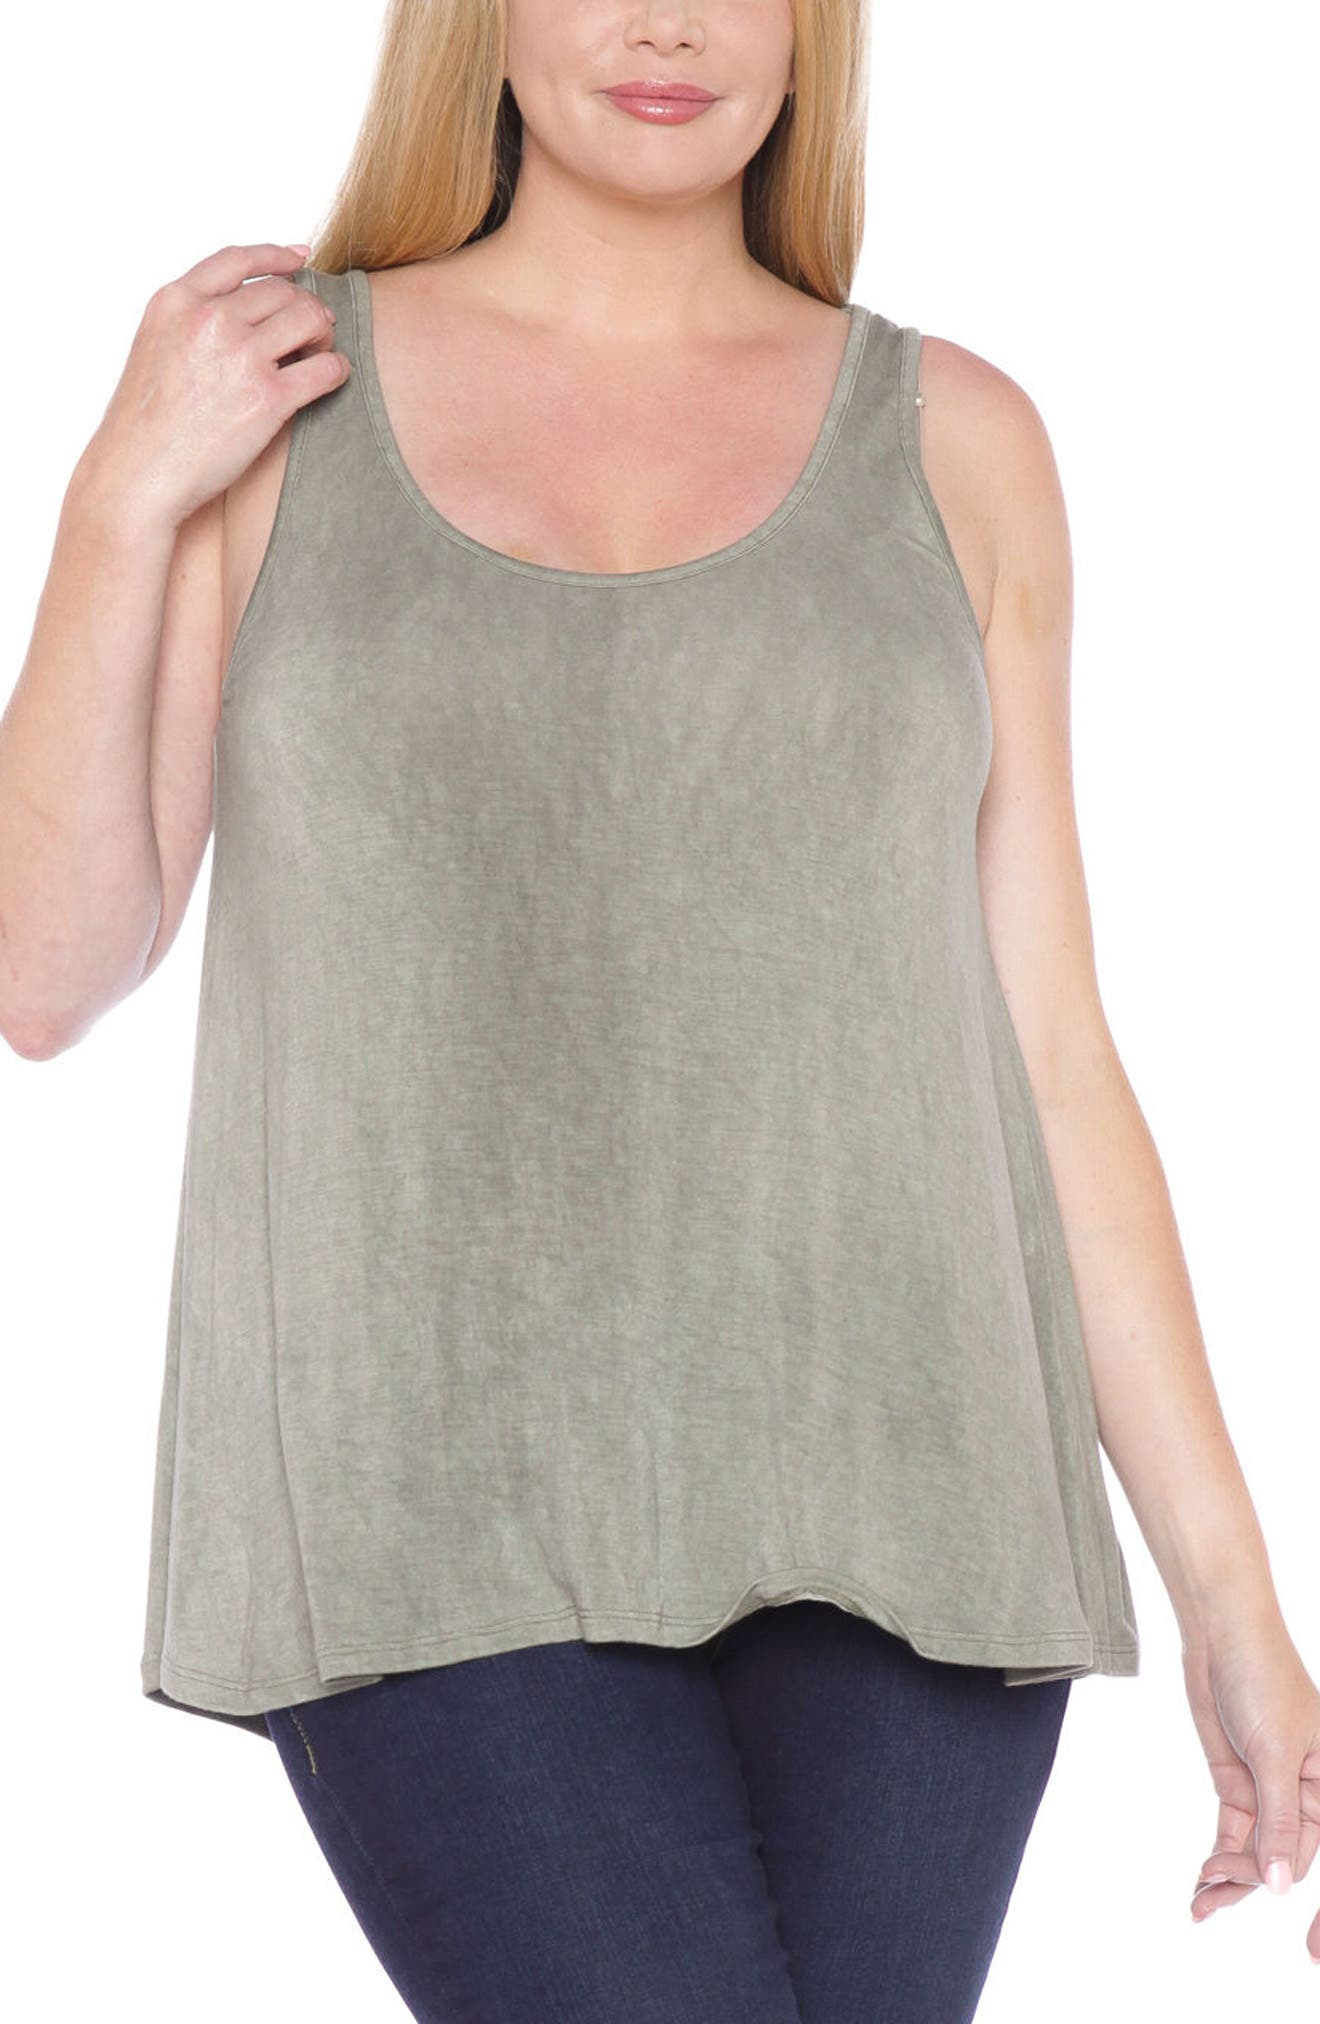 Main Image - SLINK Jeans Scoop Neck Tank Top (Plus Size)